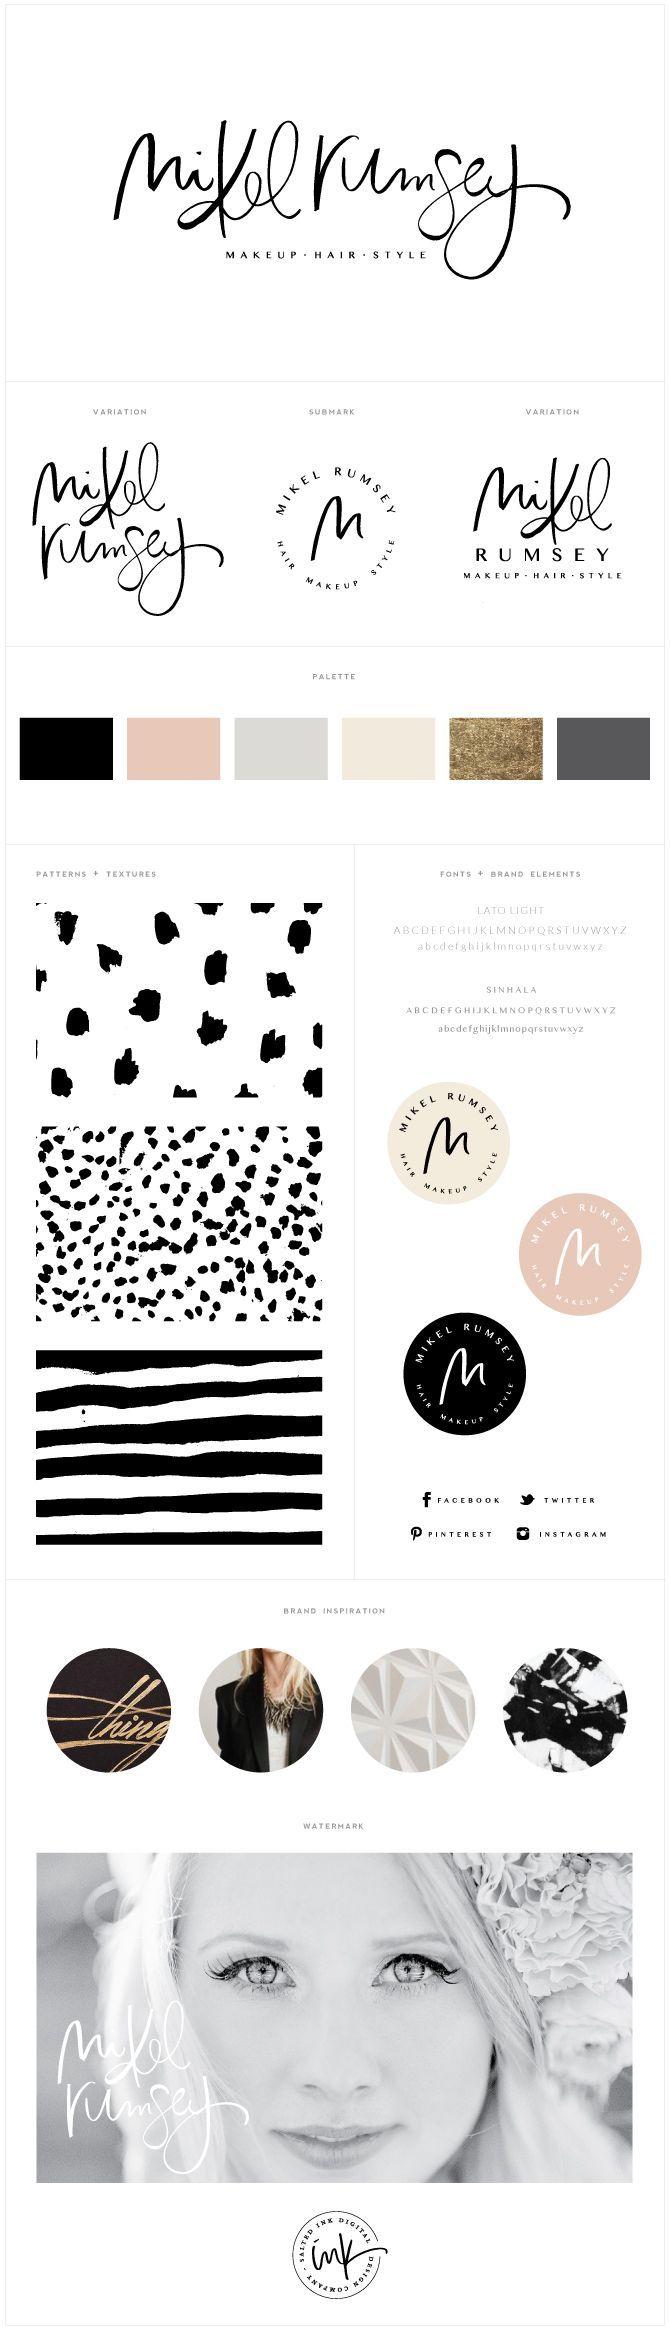 Brand Launch: Mikel Rumsey   Brand Board, Brand Styling, Brand Design, Hand Letterer, Hand Lettered, Hand Drawn, Brush Pen   www.saltedink.com